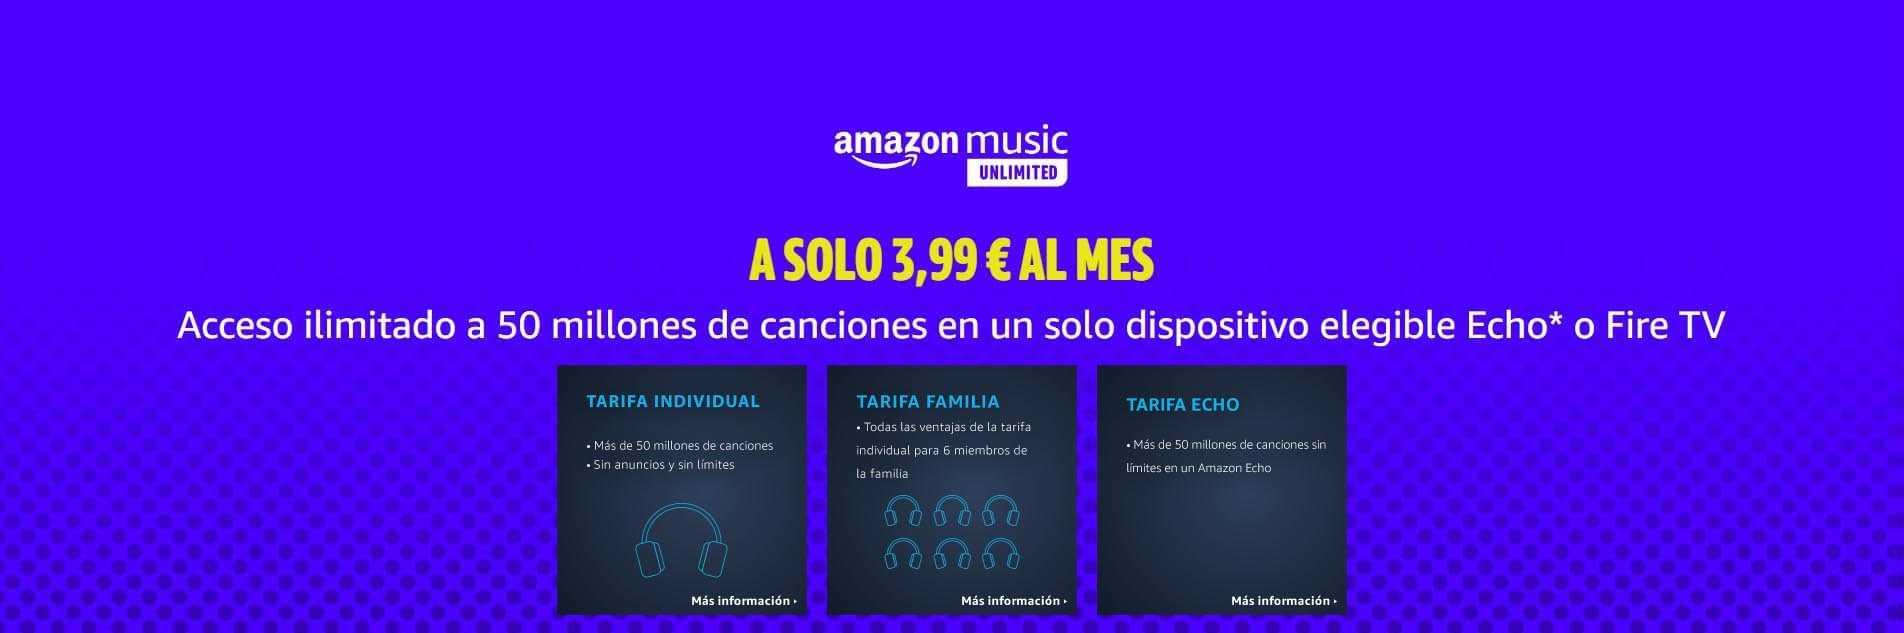 Precio de Amazon Music Unlimited